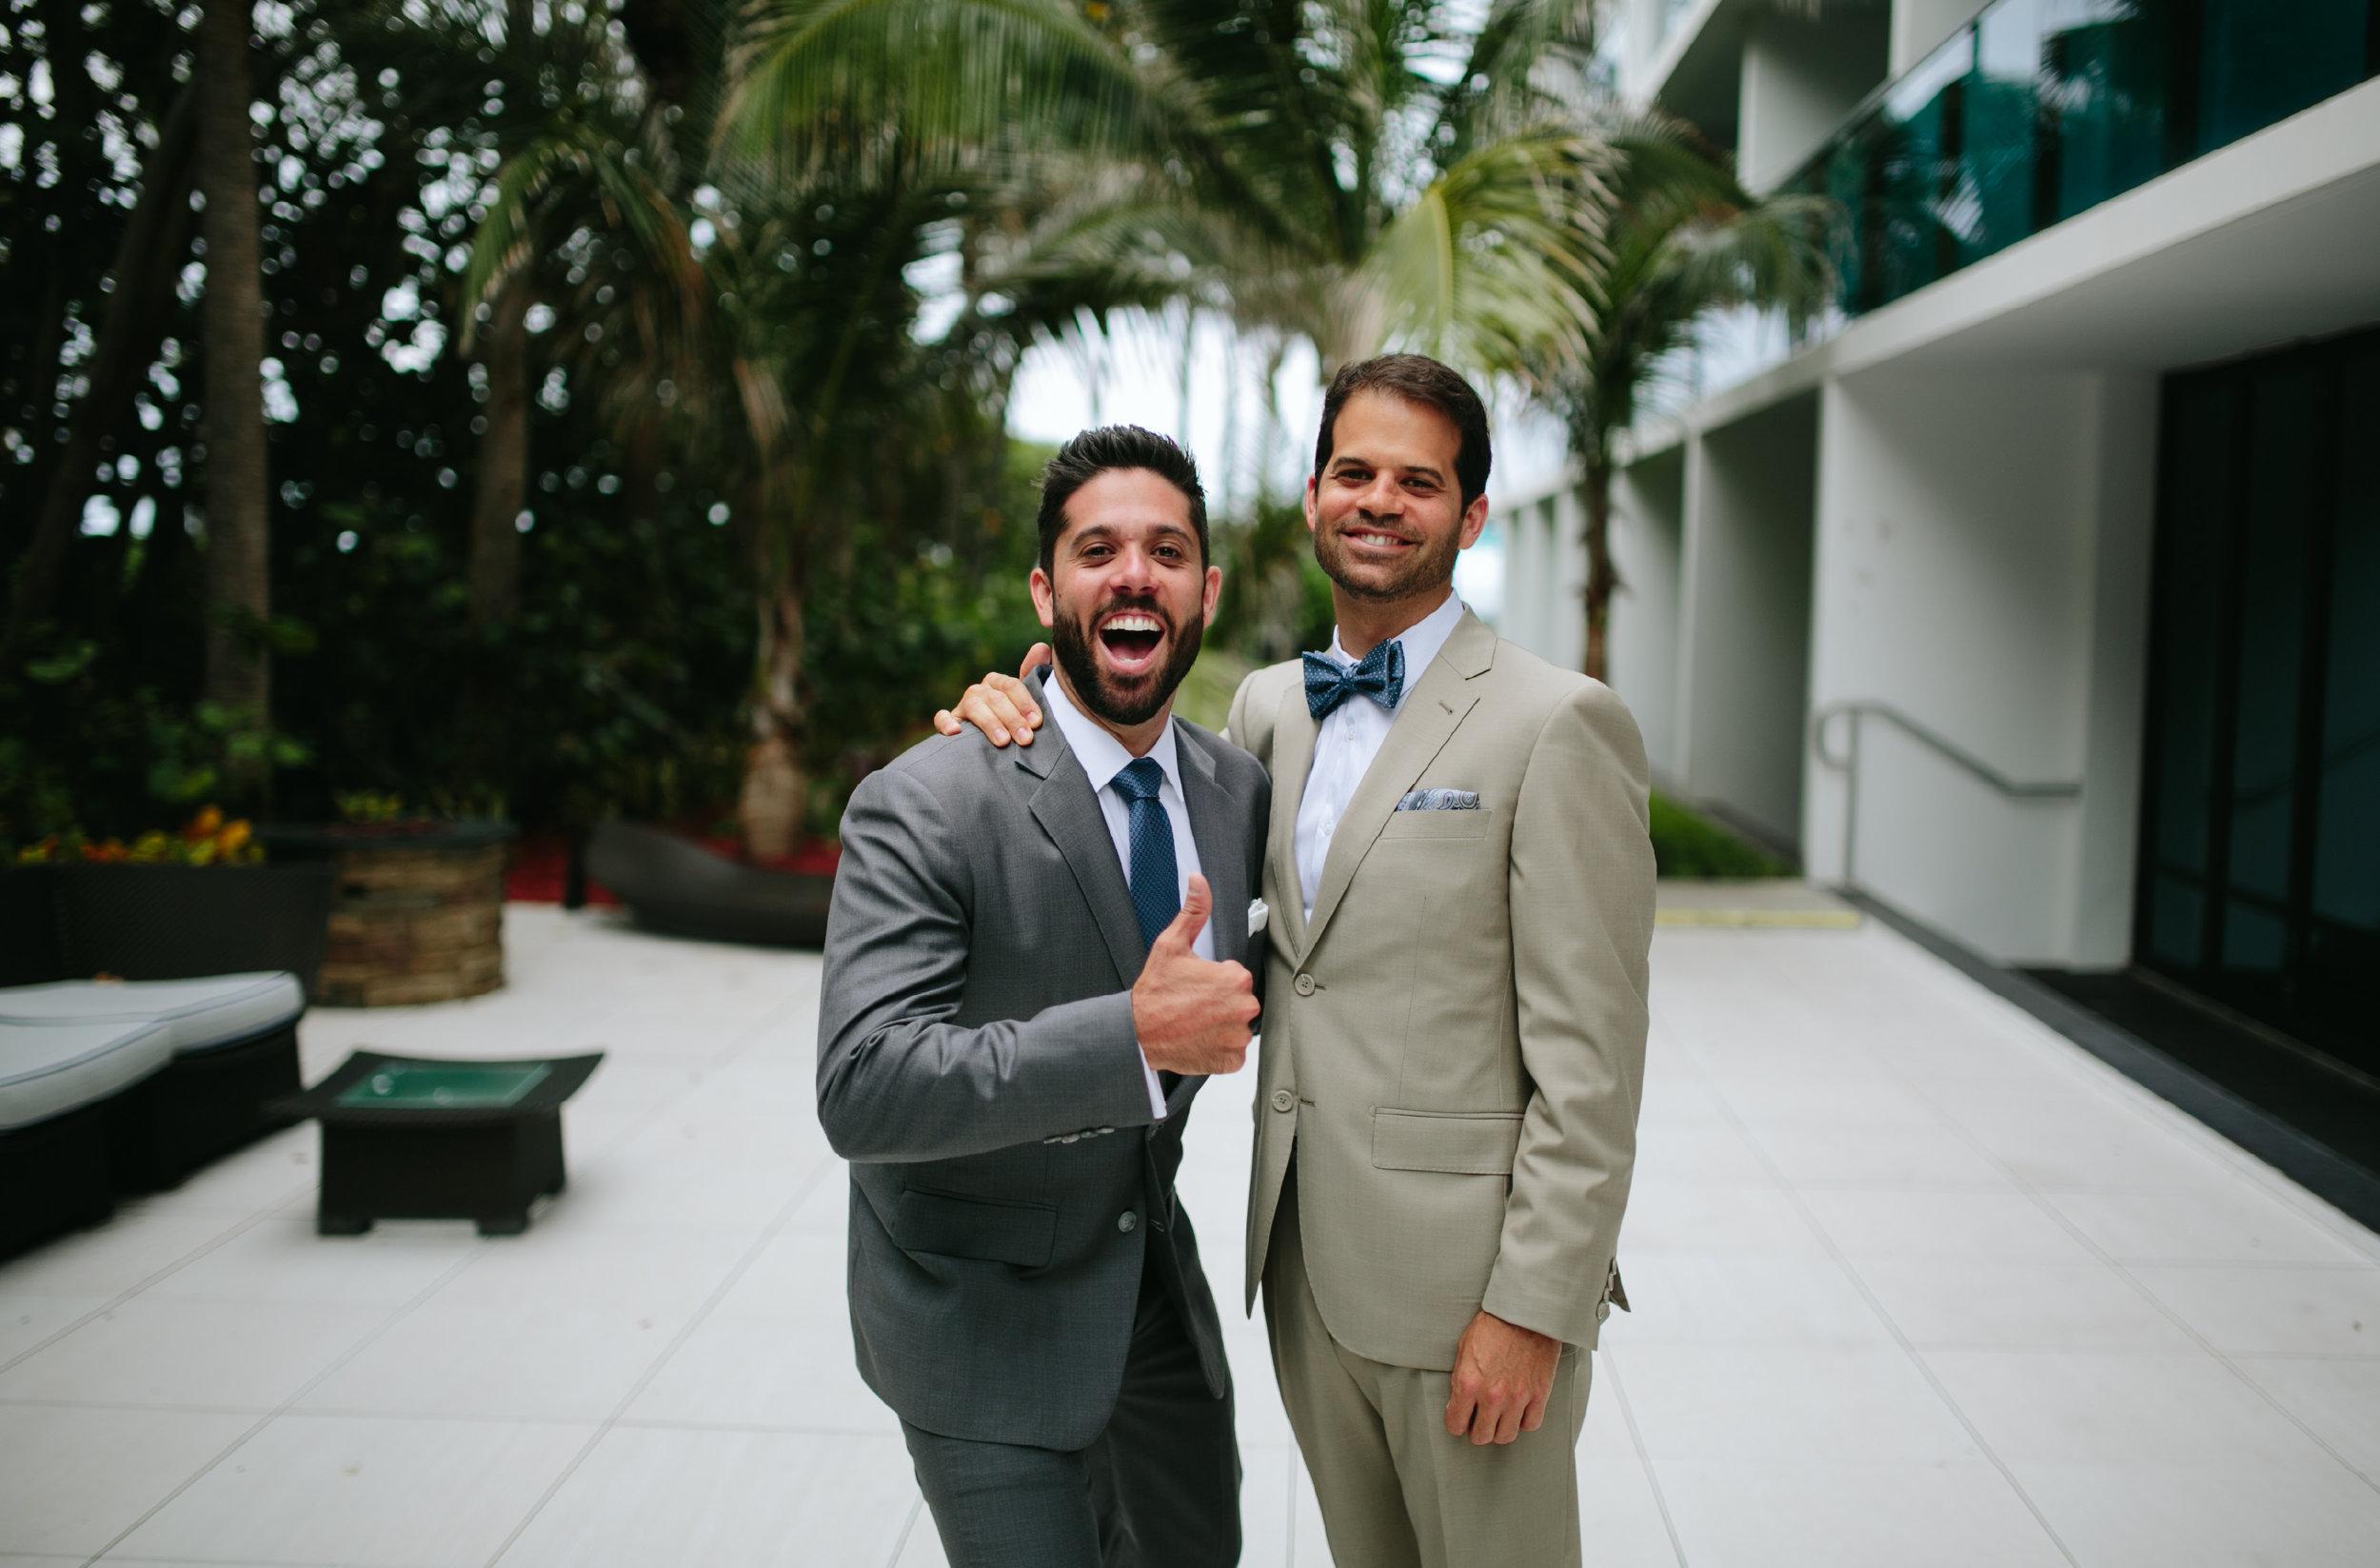 Wedding at the Tideline Resort in Palm Beach17.jpg